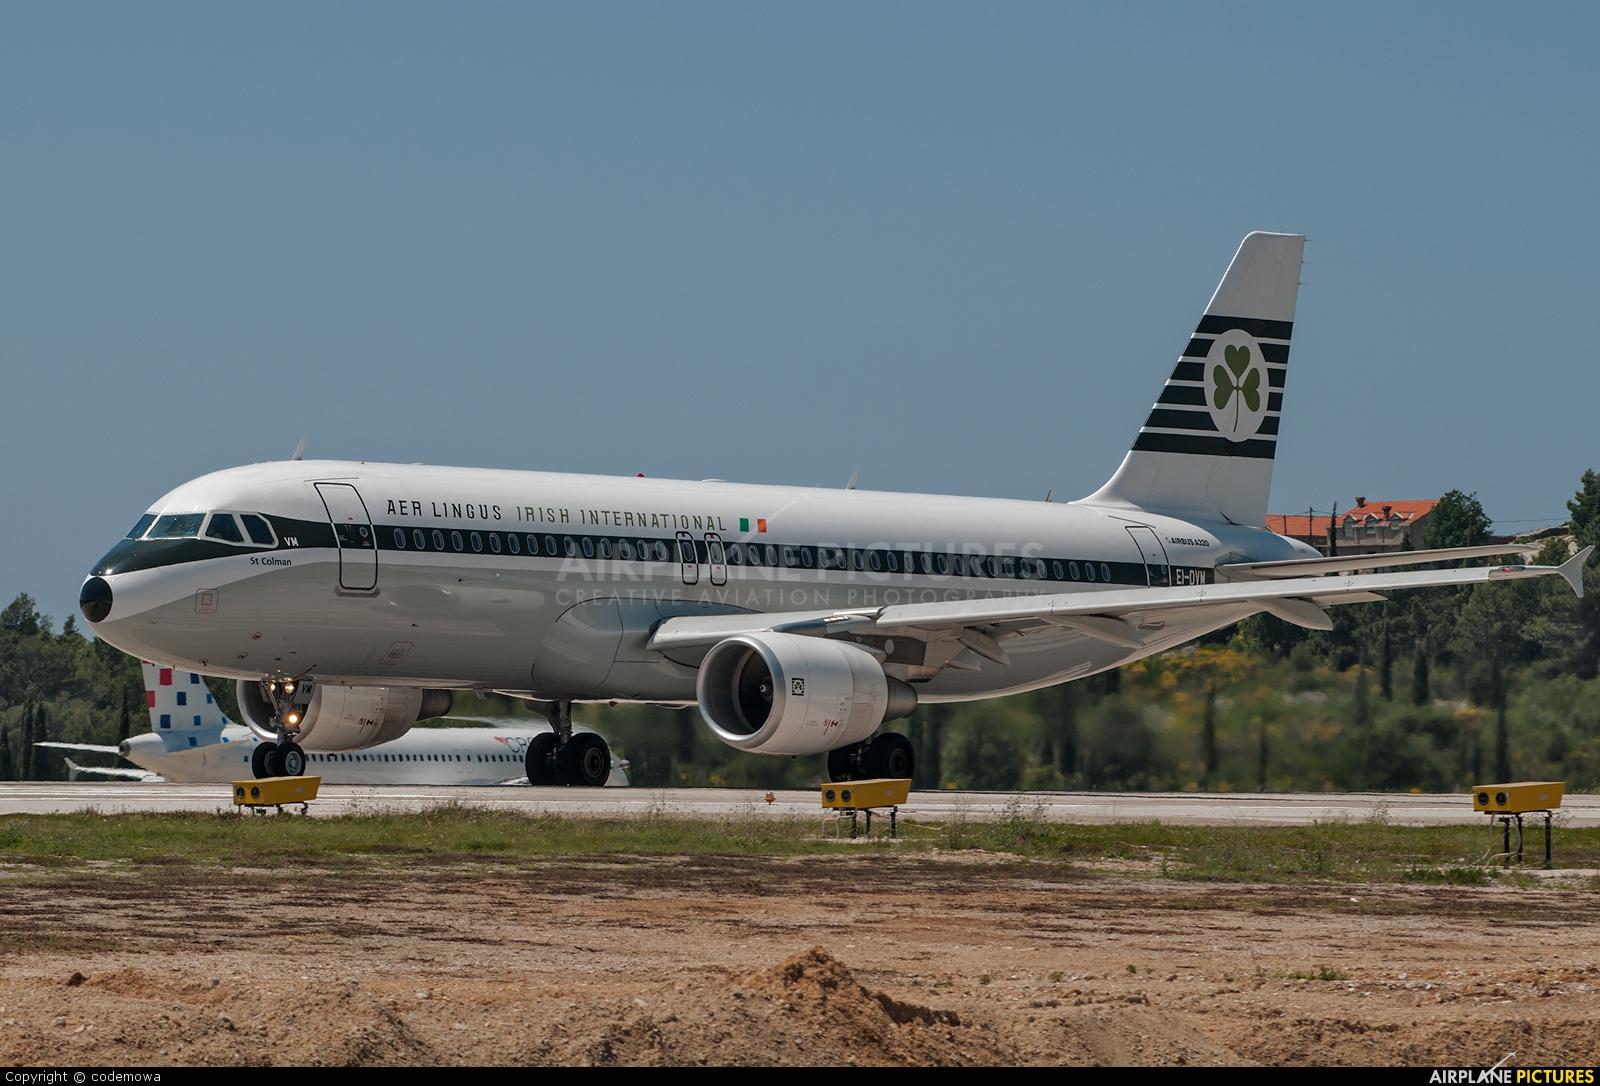 Aer Lingus EI-DVM aircraft at Dubrovnik